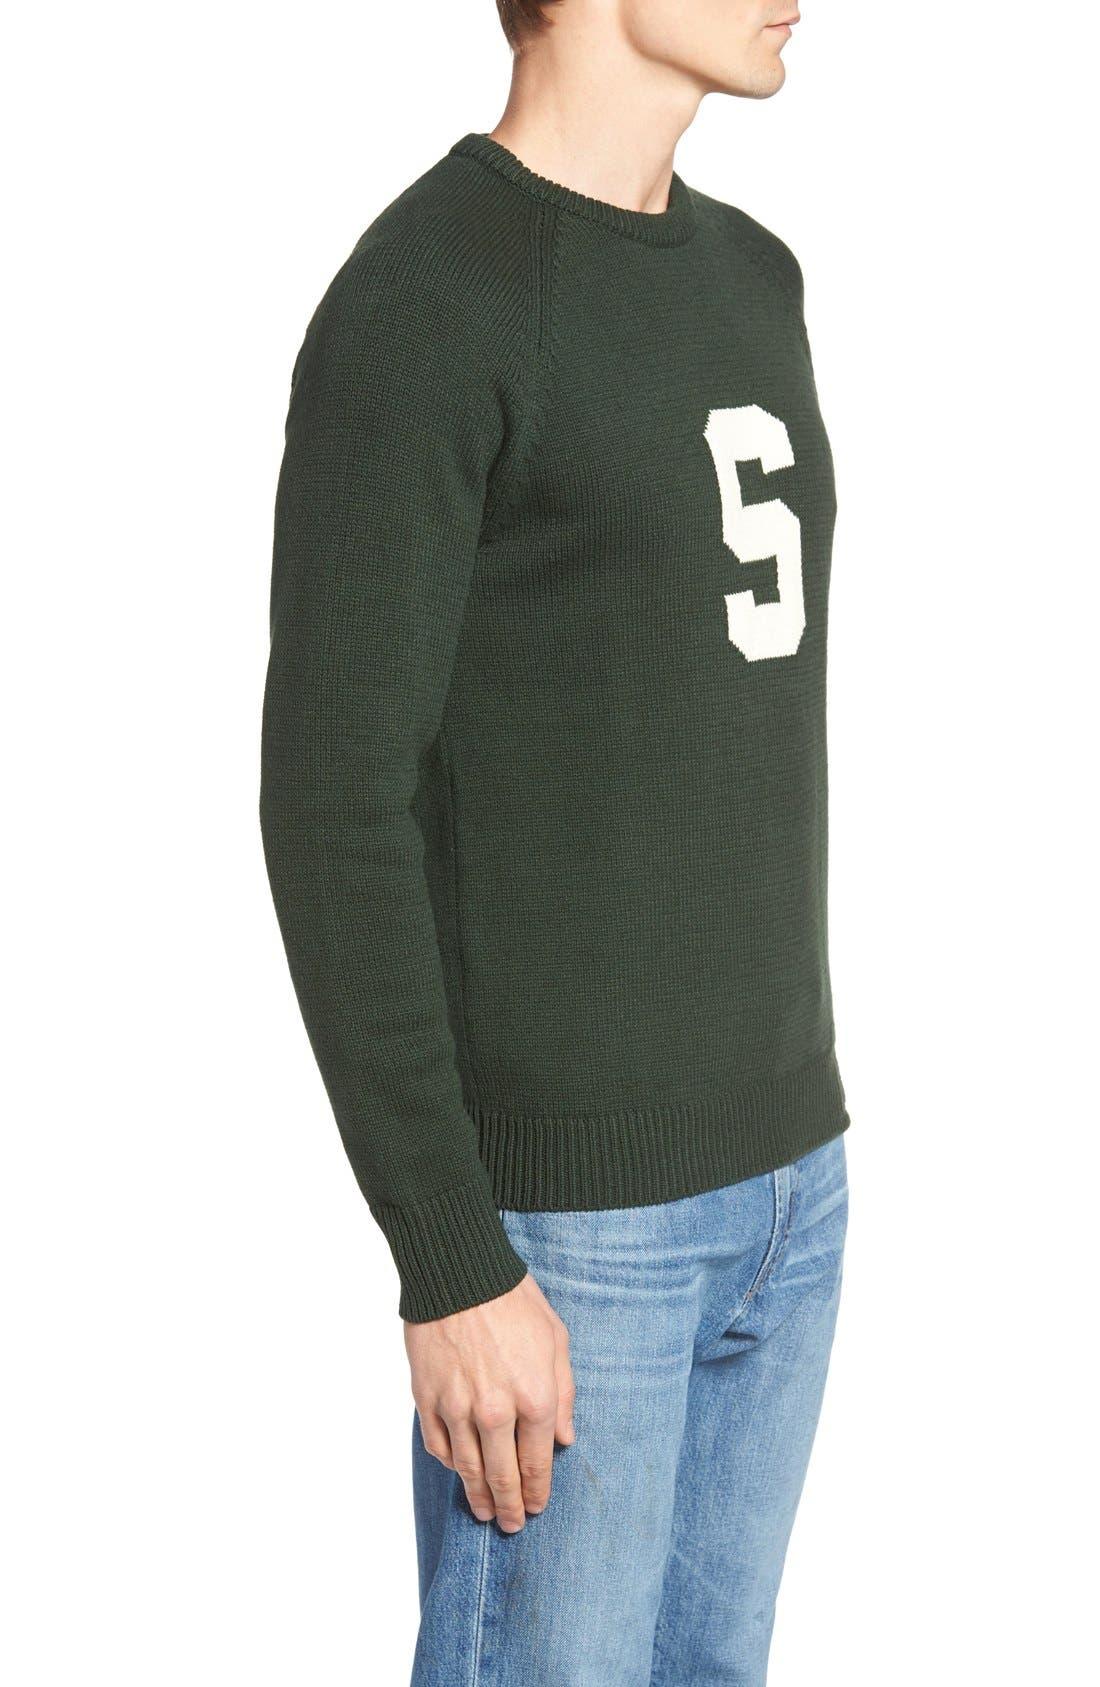 HILLFLINT,                             Michigan State Heritage Sweater,                             Alternate thumbnail 3, color,                             300